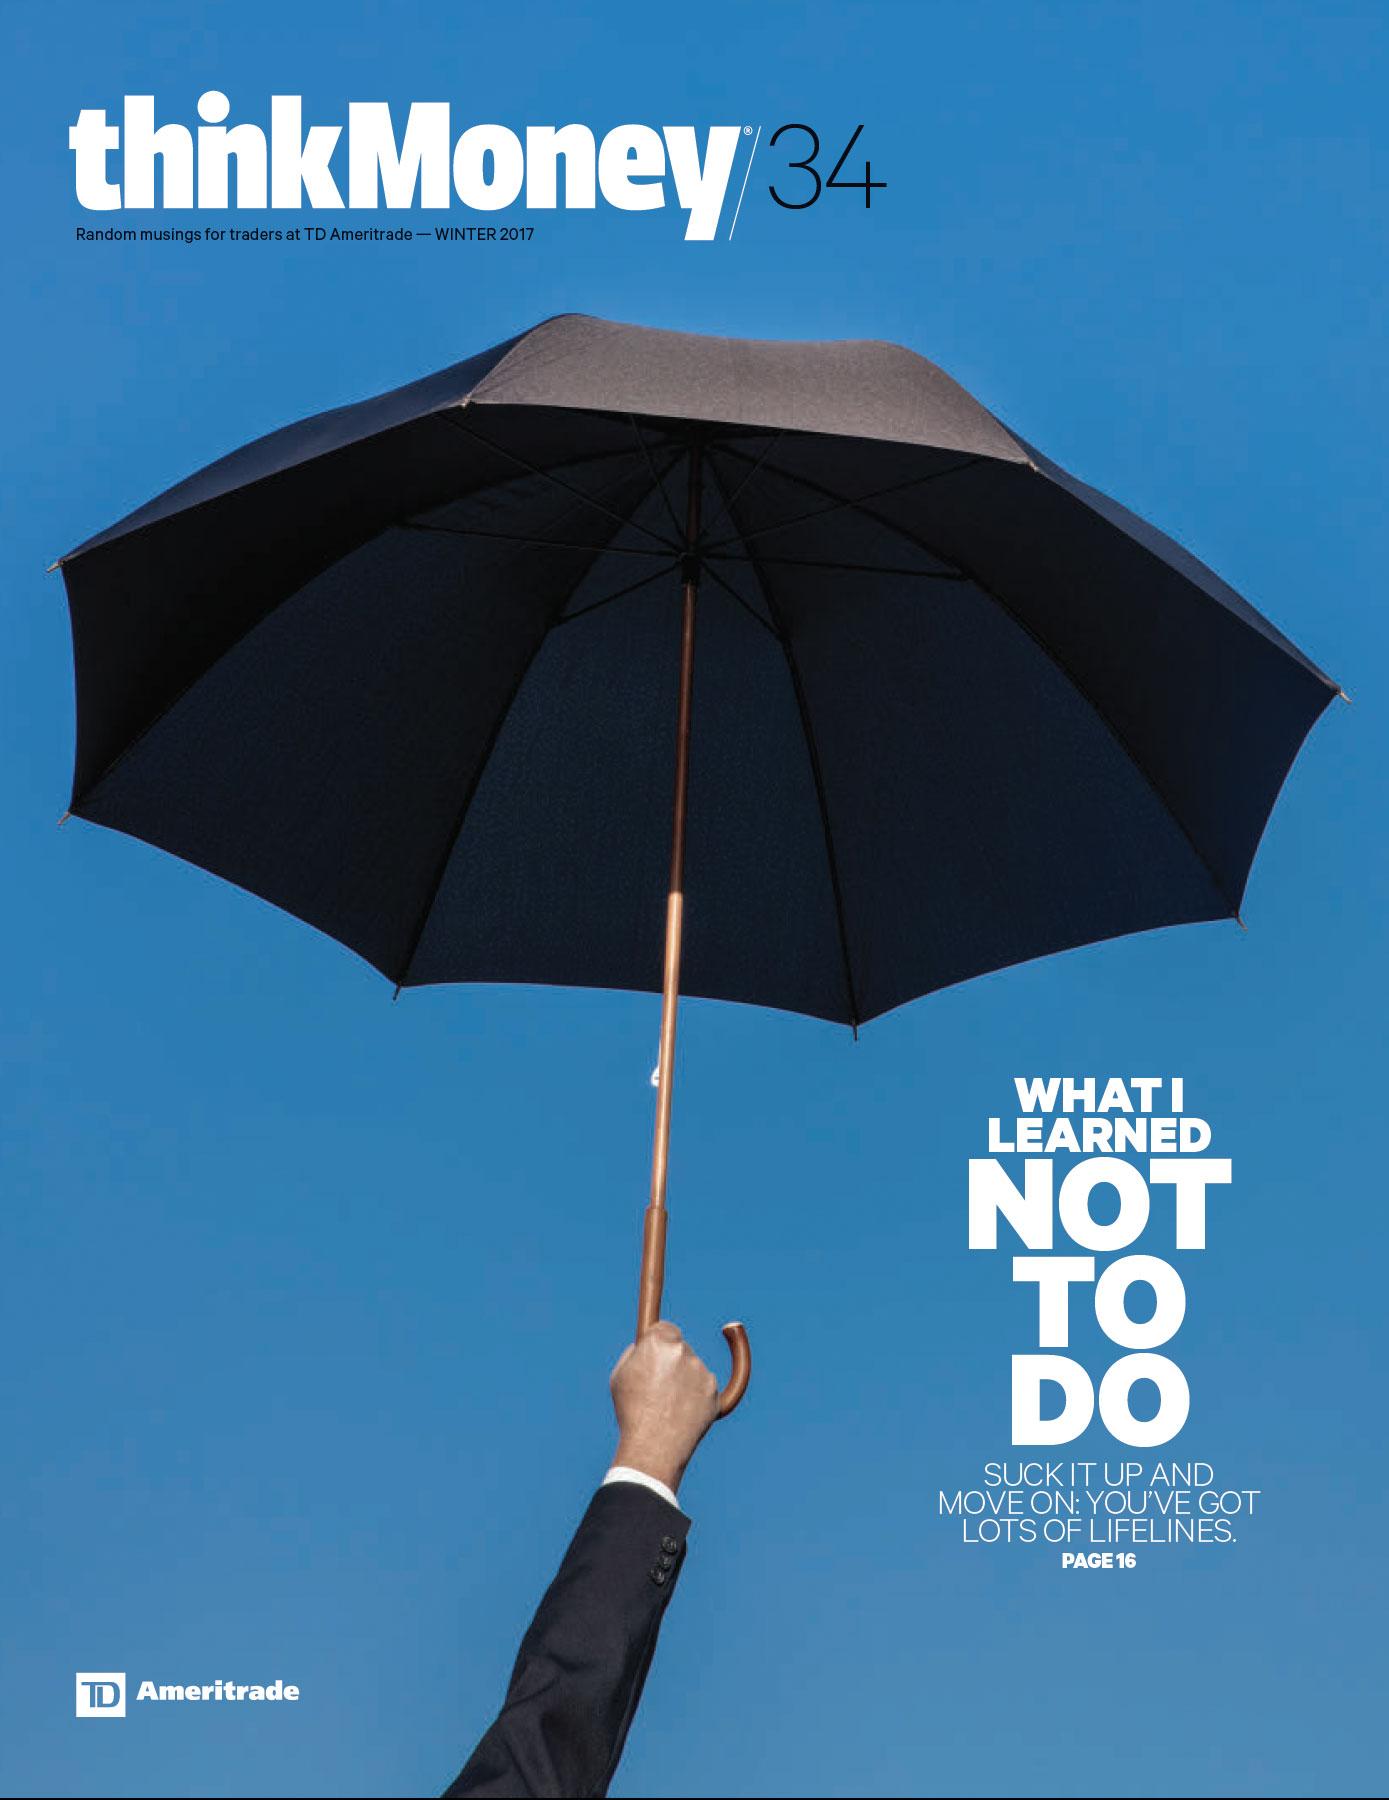 tdameritrade-thinkmoney-magazine